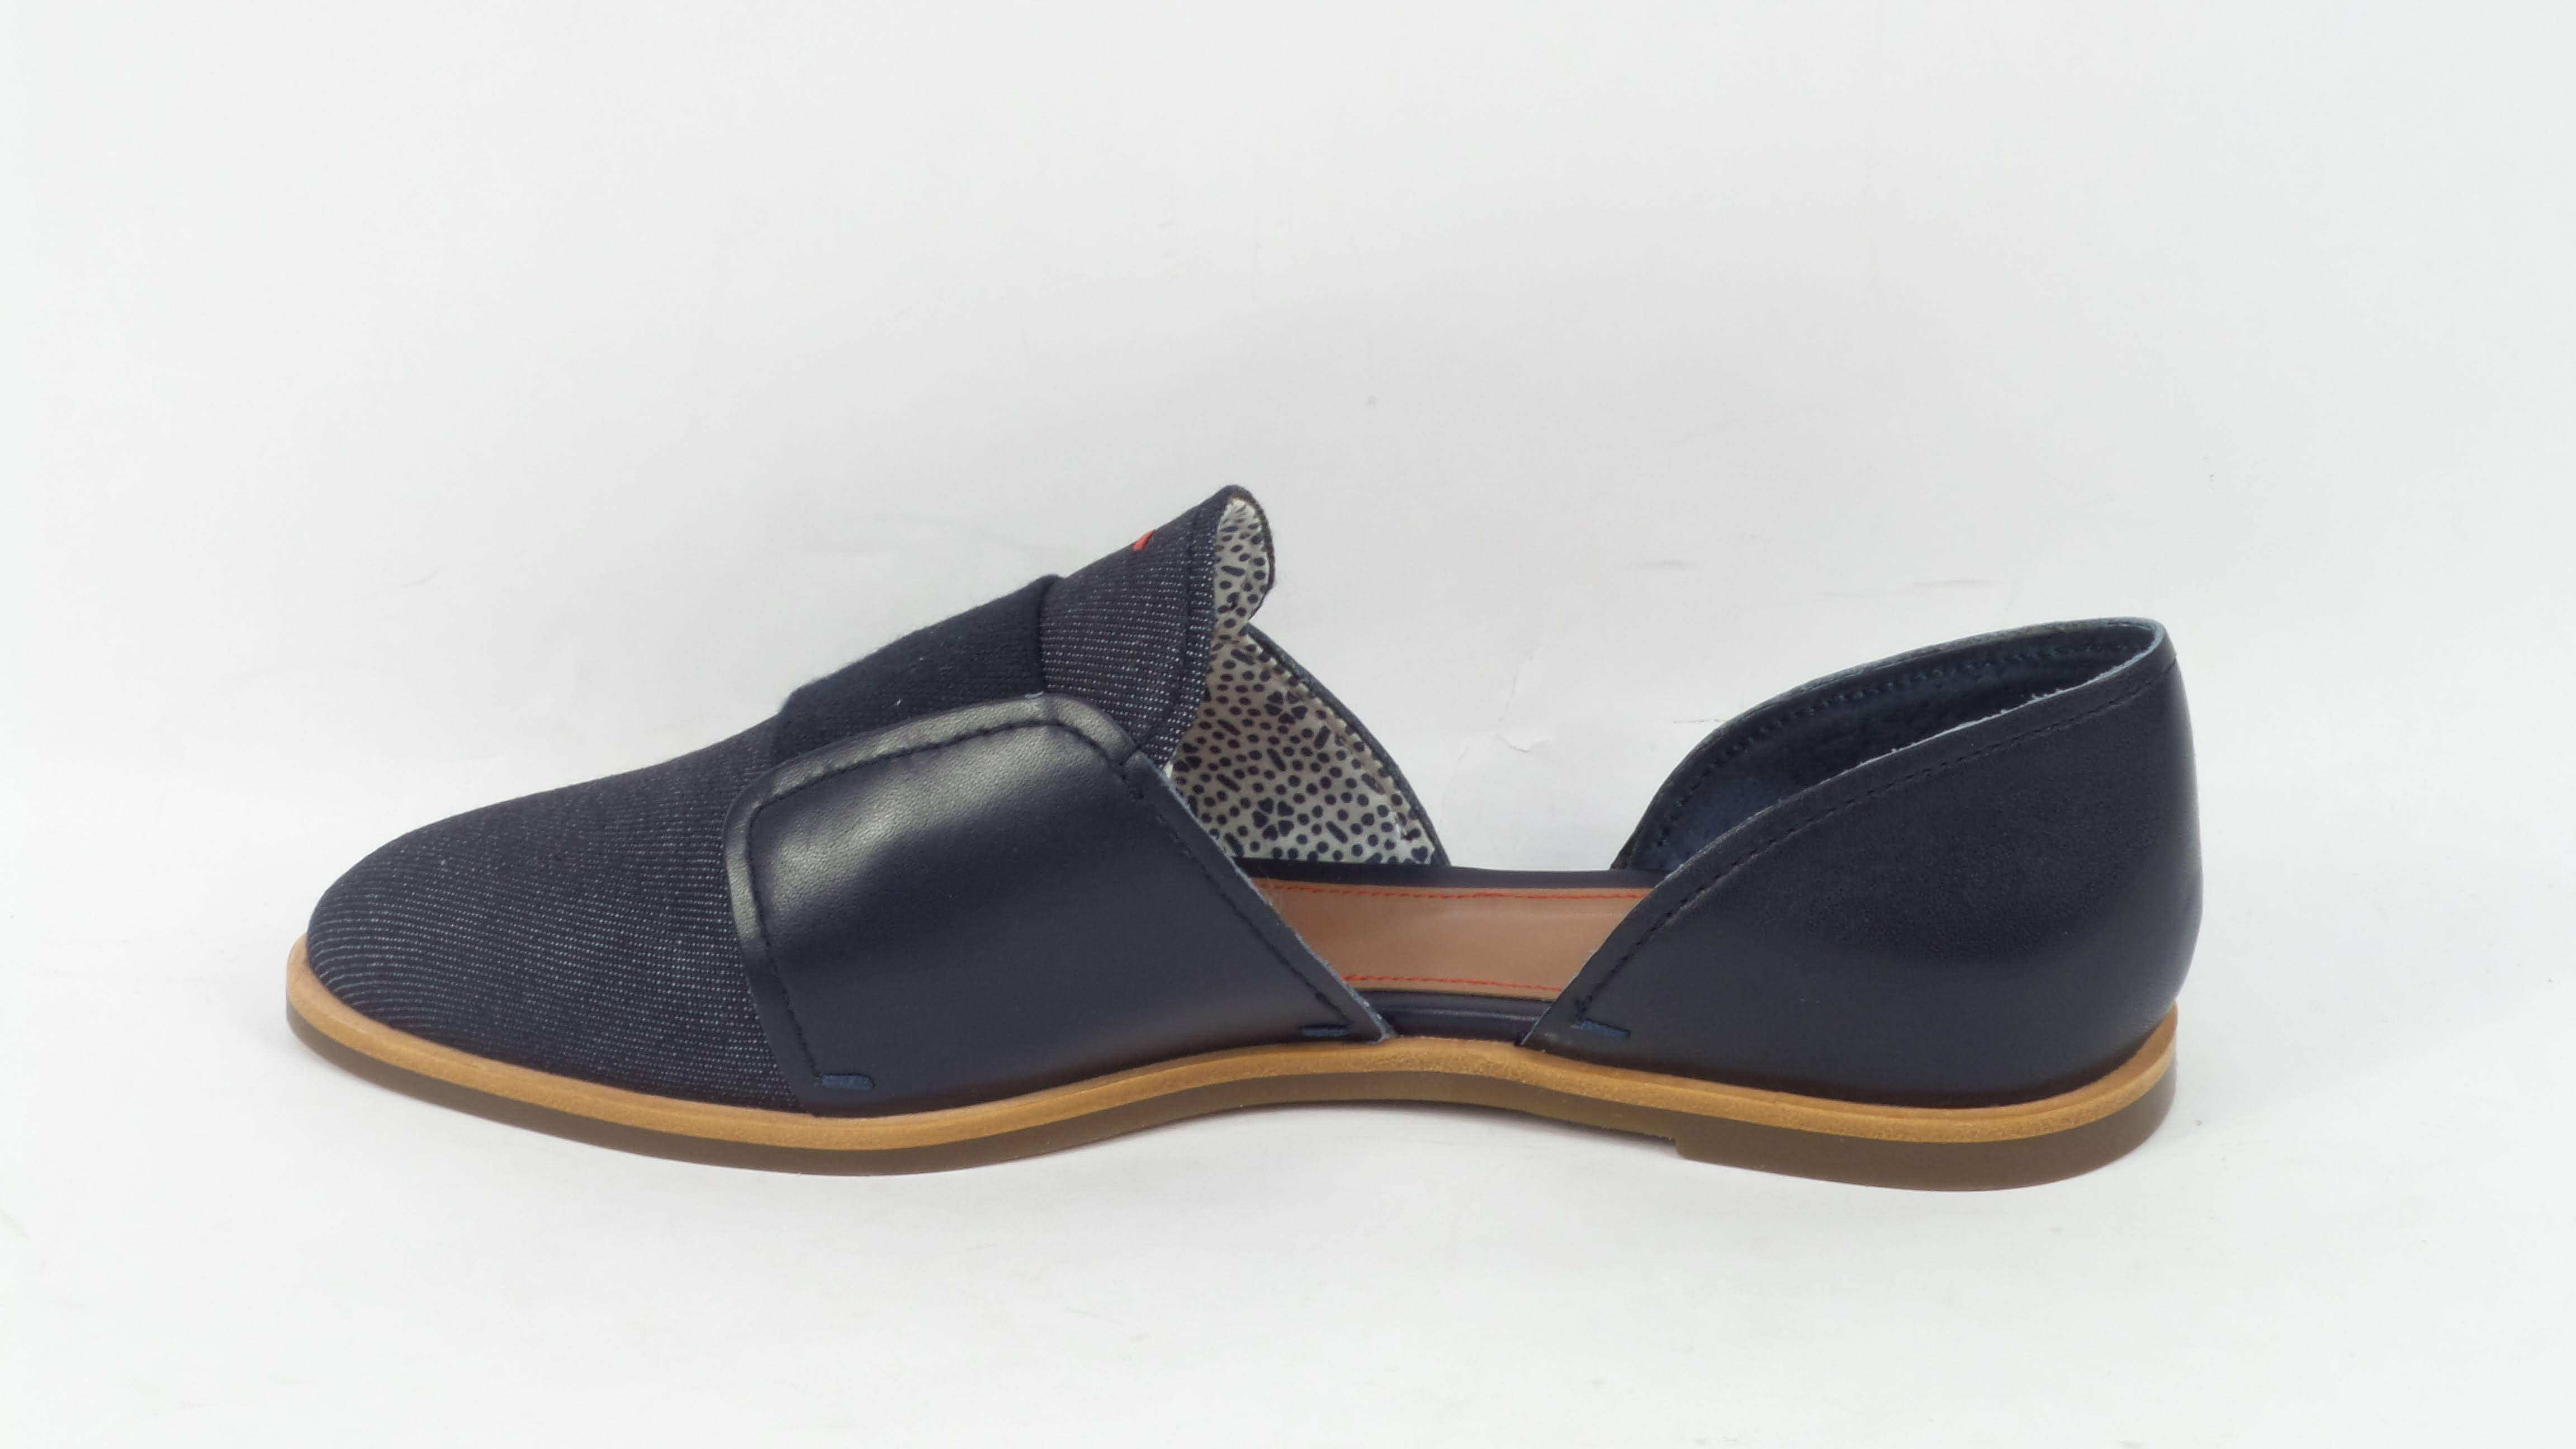 Kizi Black Women/'s Size 5 ED Ellen DeGeneres Leather Pointed-Toe Flats